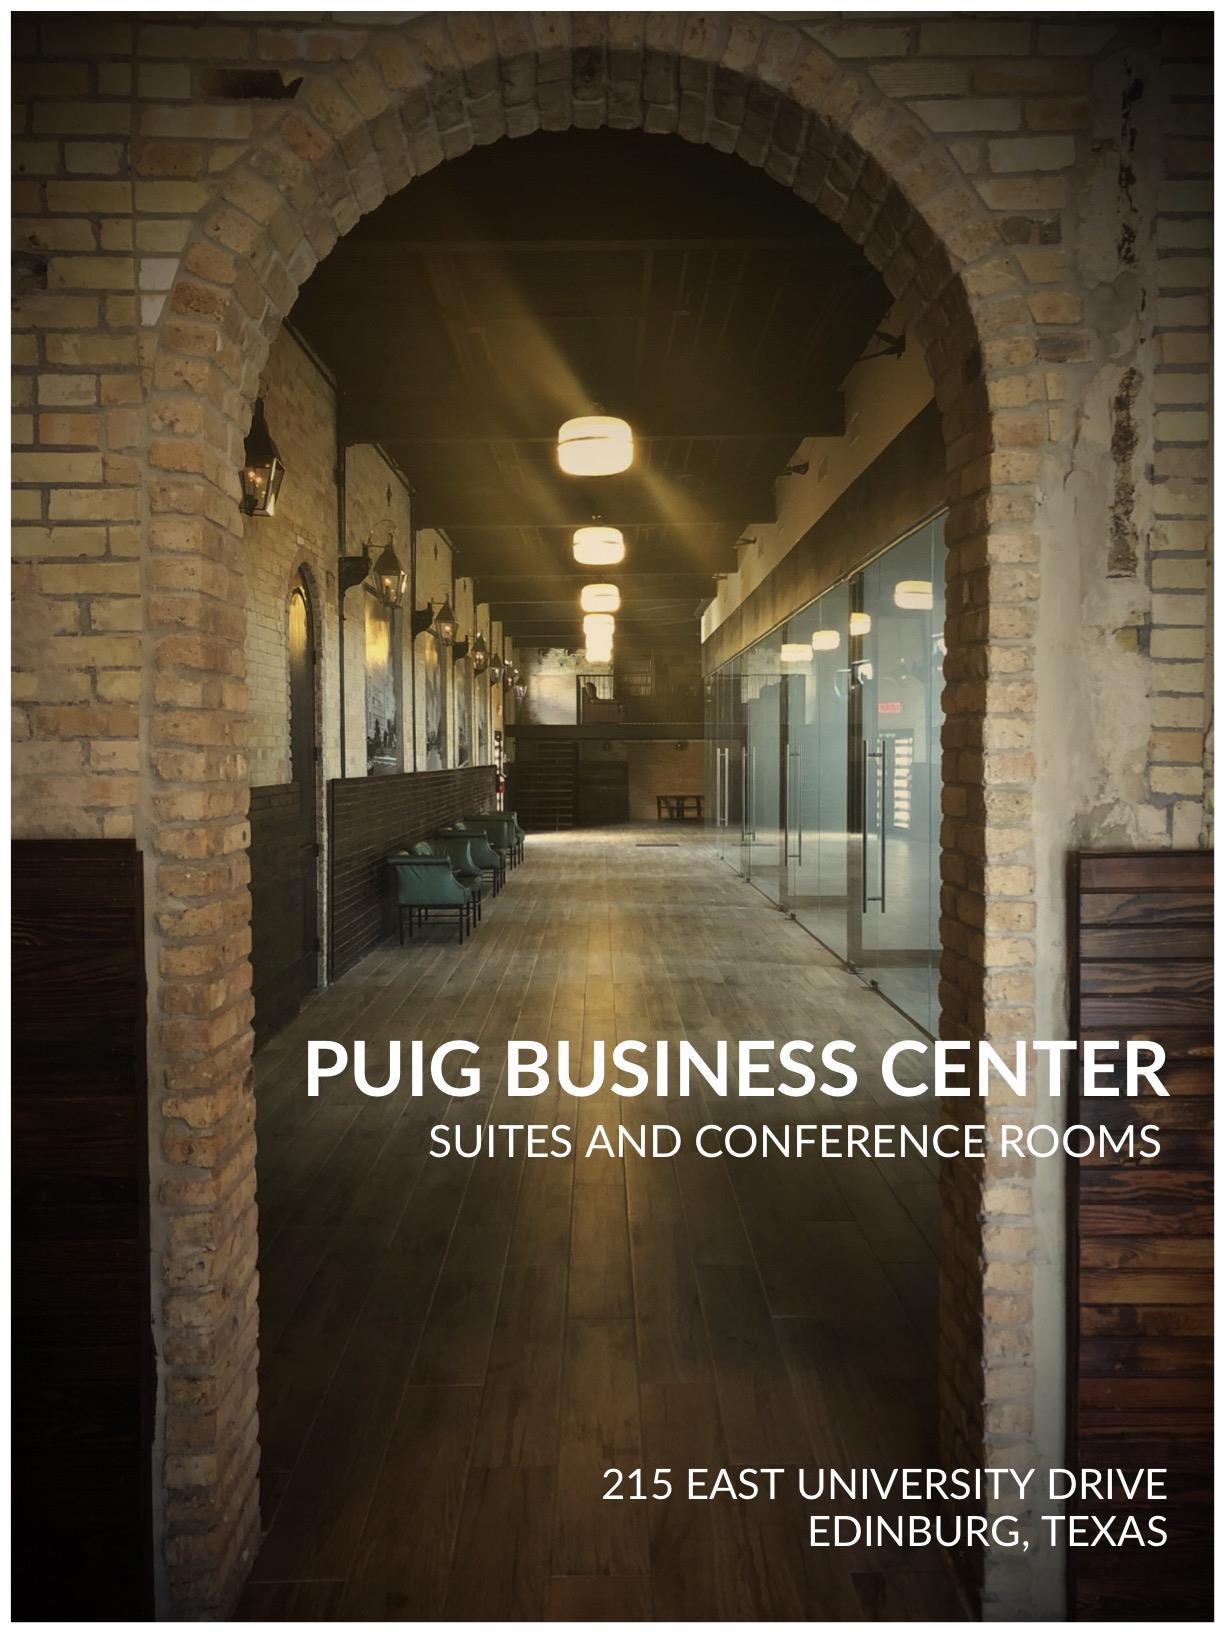 Puig Business Center - Office Suites